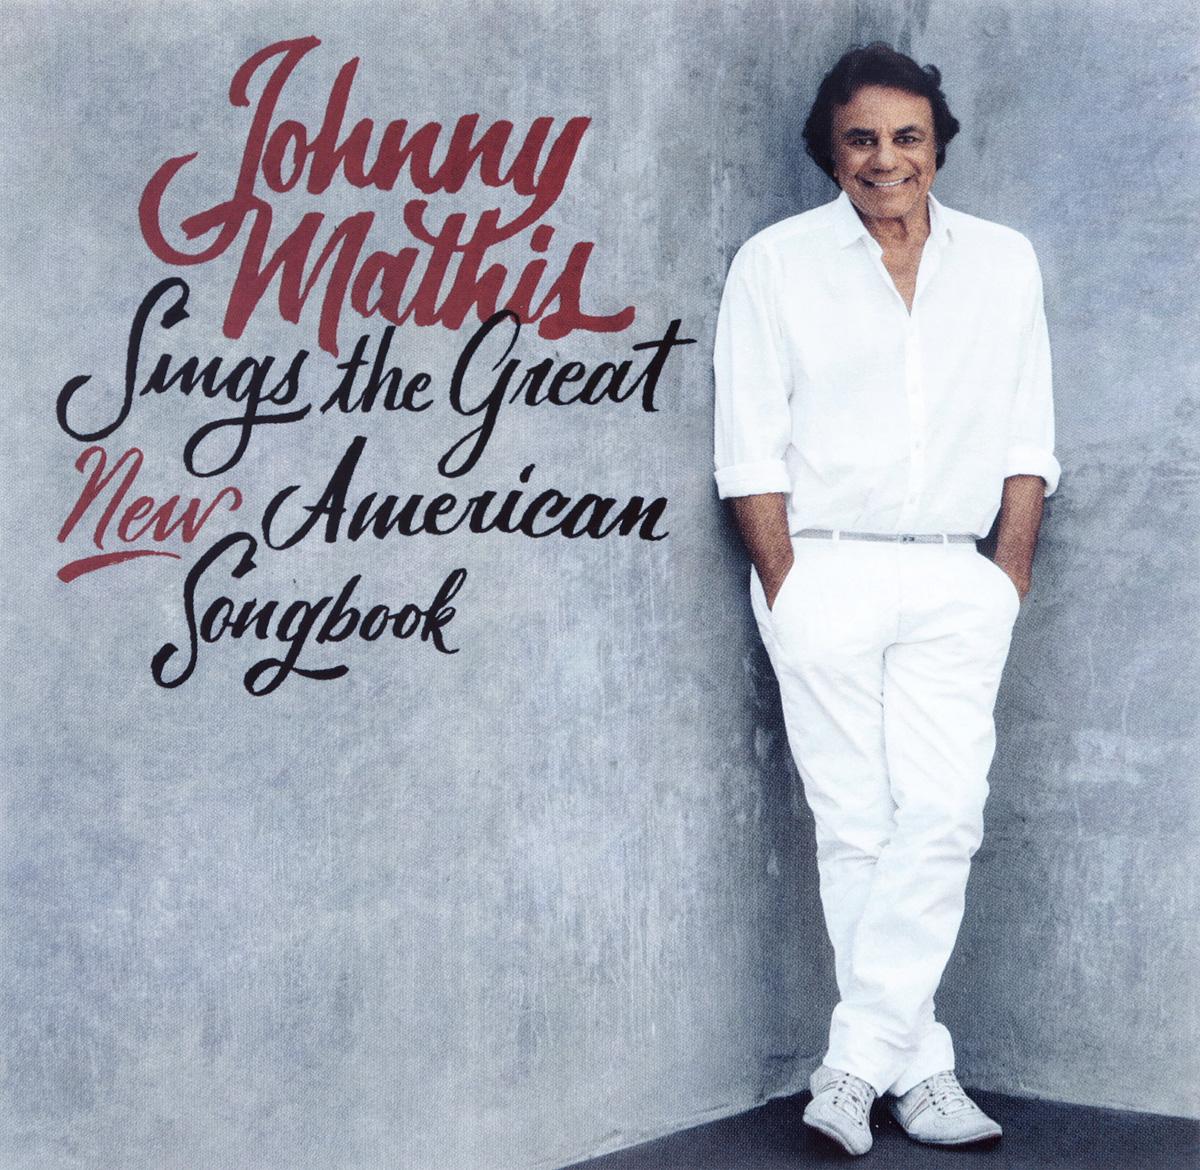 Джонни Мэтис Johnny Mathis. Johnny Mathis Sings The Great New American Songbook джонни хортон johnny horton the ballads of johnny horton